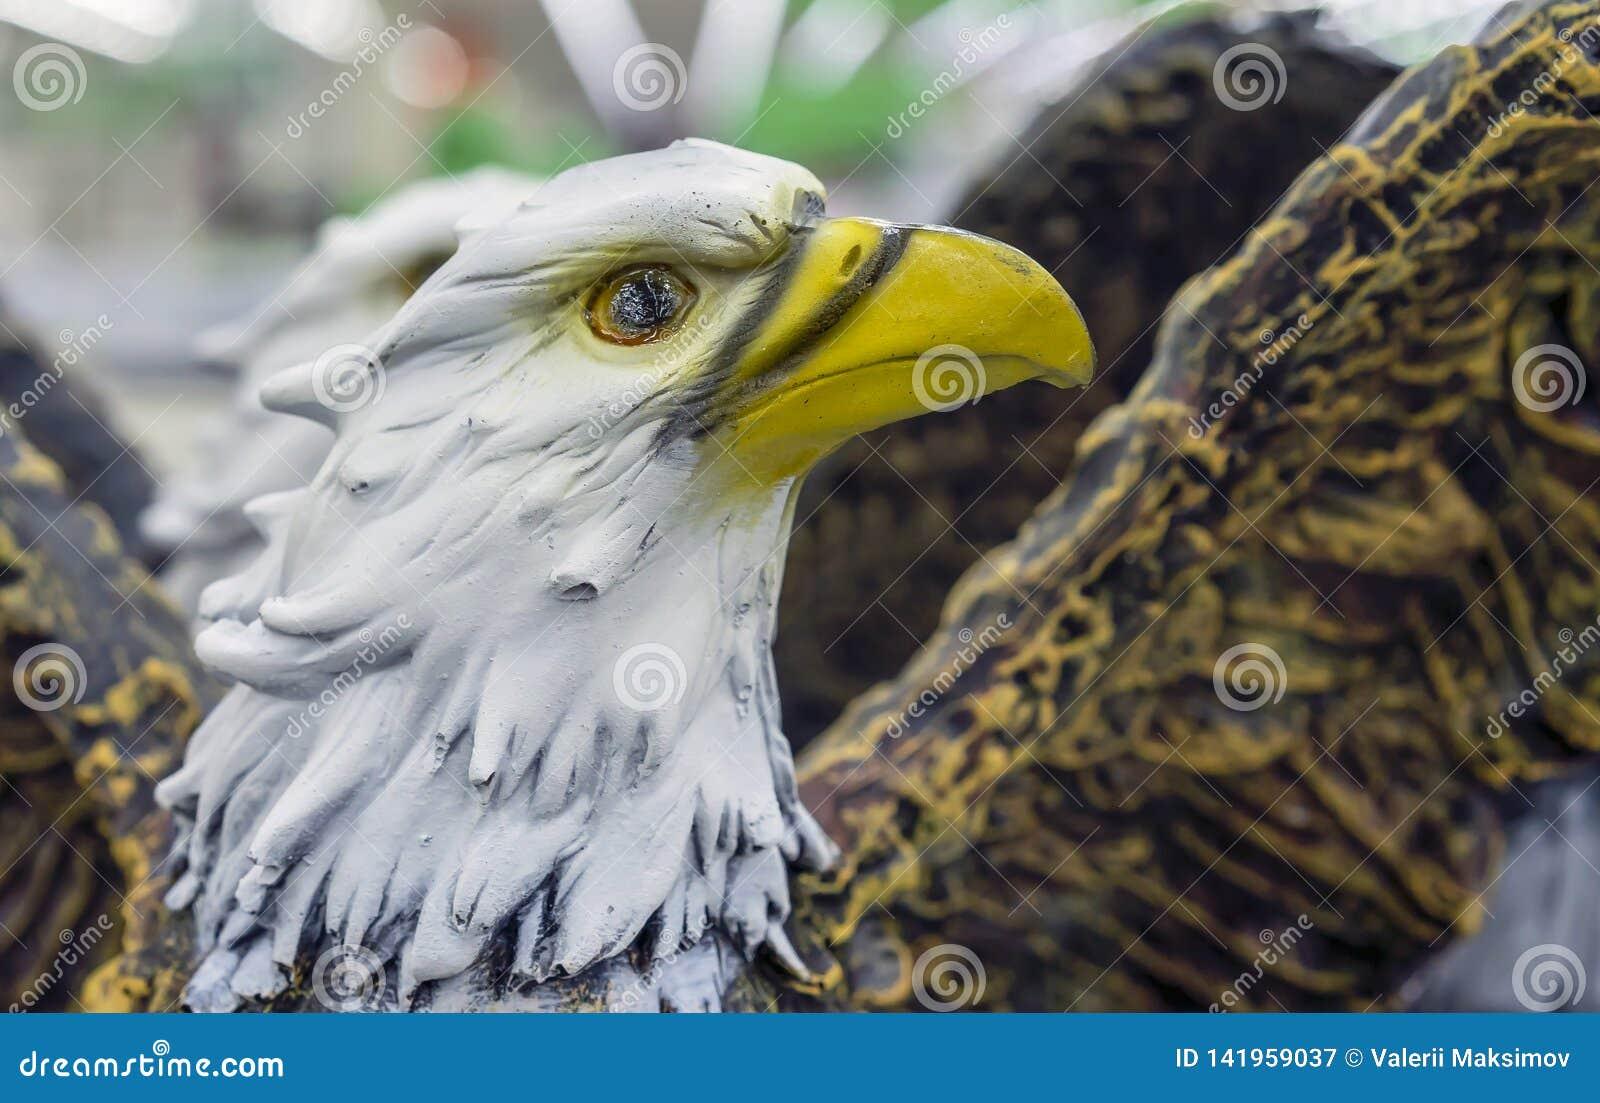 Figurilla de cerámica del águila calva en una tienda de souvenirs